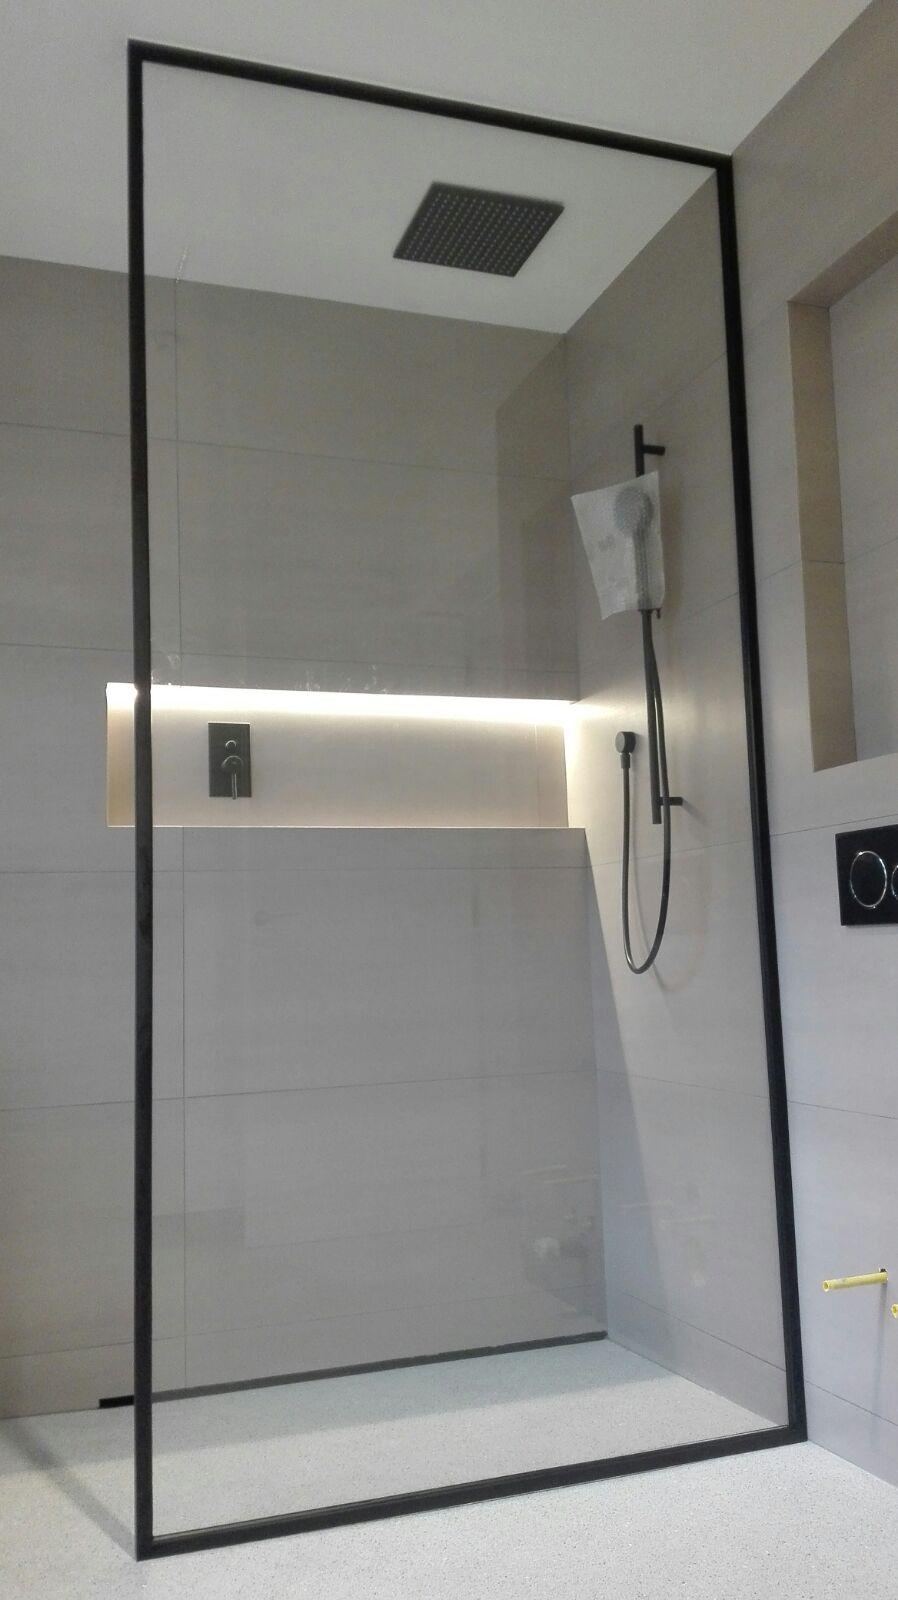 vetreria gottardi, gottardi pergine, doccia, vetro, doccia in vetro, docce, doccia trasparente